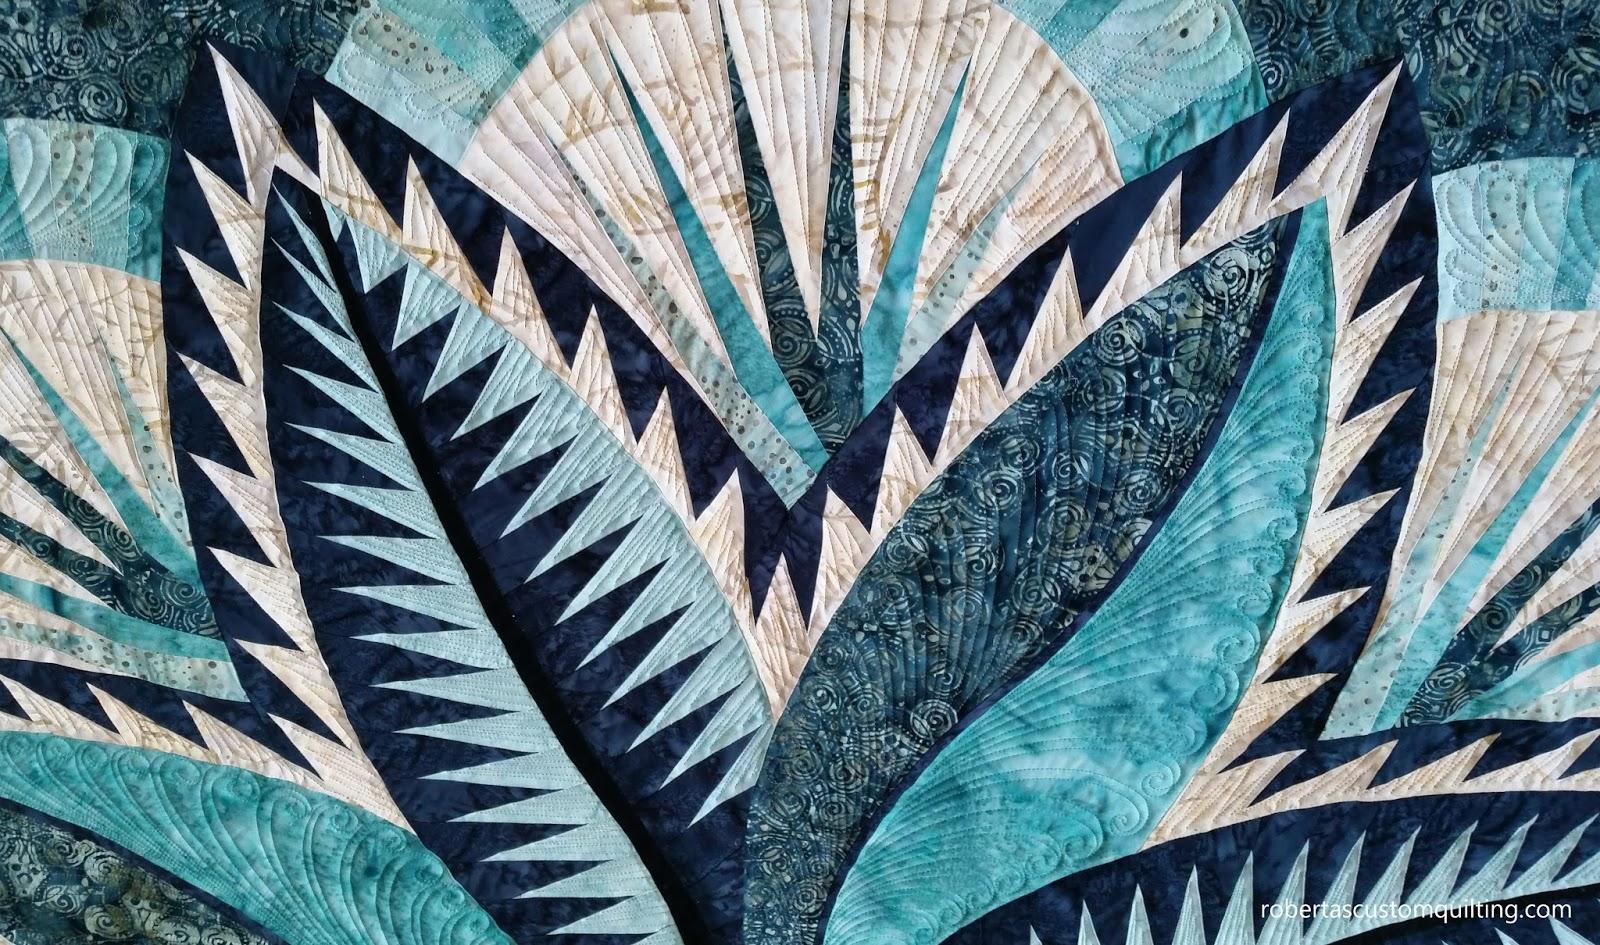 Roberta S Custom Quilting Fire Island Hosta Judy Niemeyer